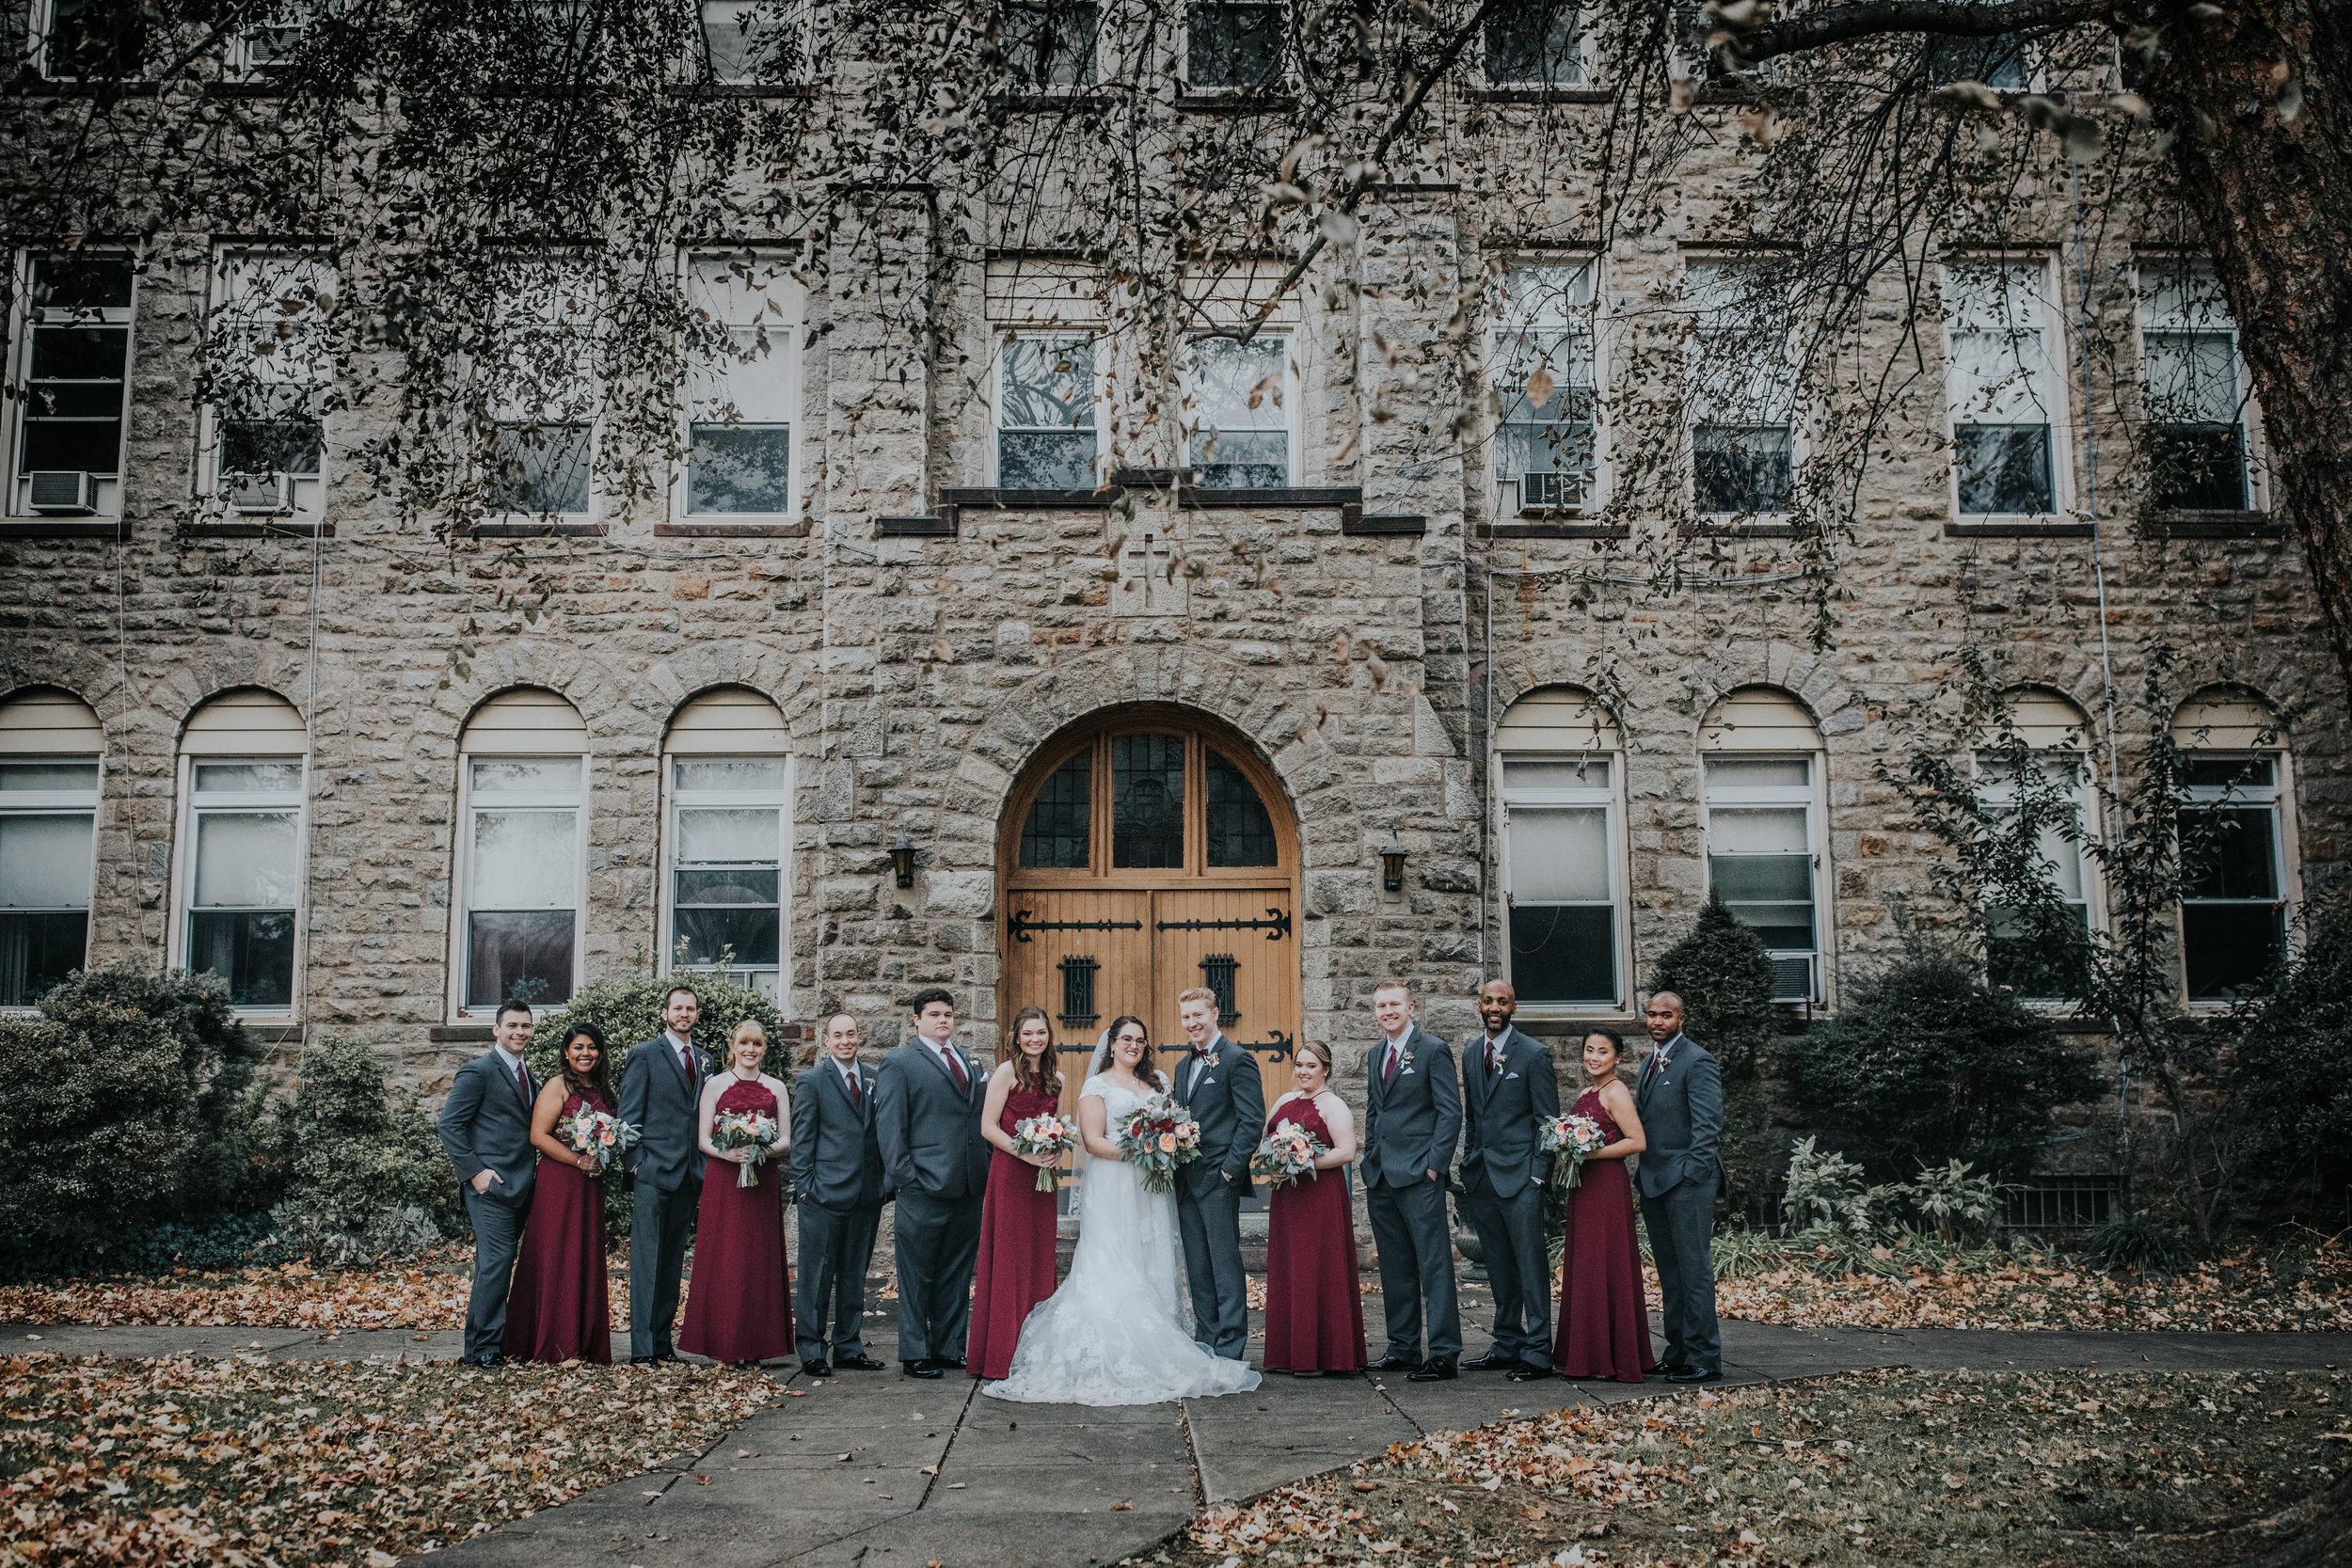 New-Jersey-Wedding-Photography-Fishers-Tudor-House-JennaLynnPhotography-BridalParty-Kathleen&Eddie-1.jpg